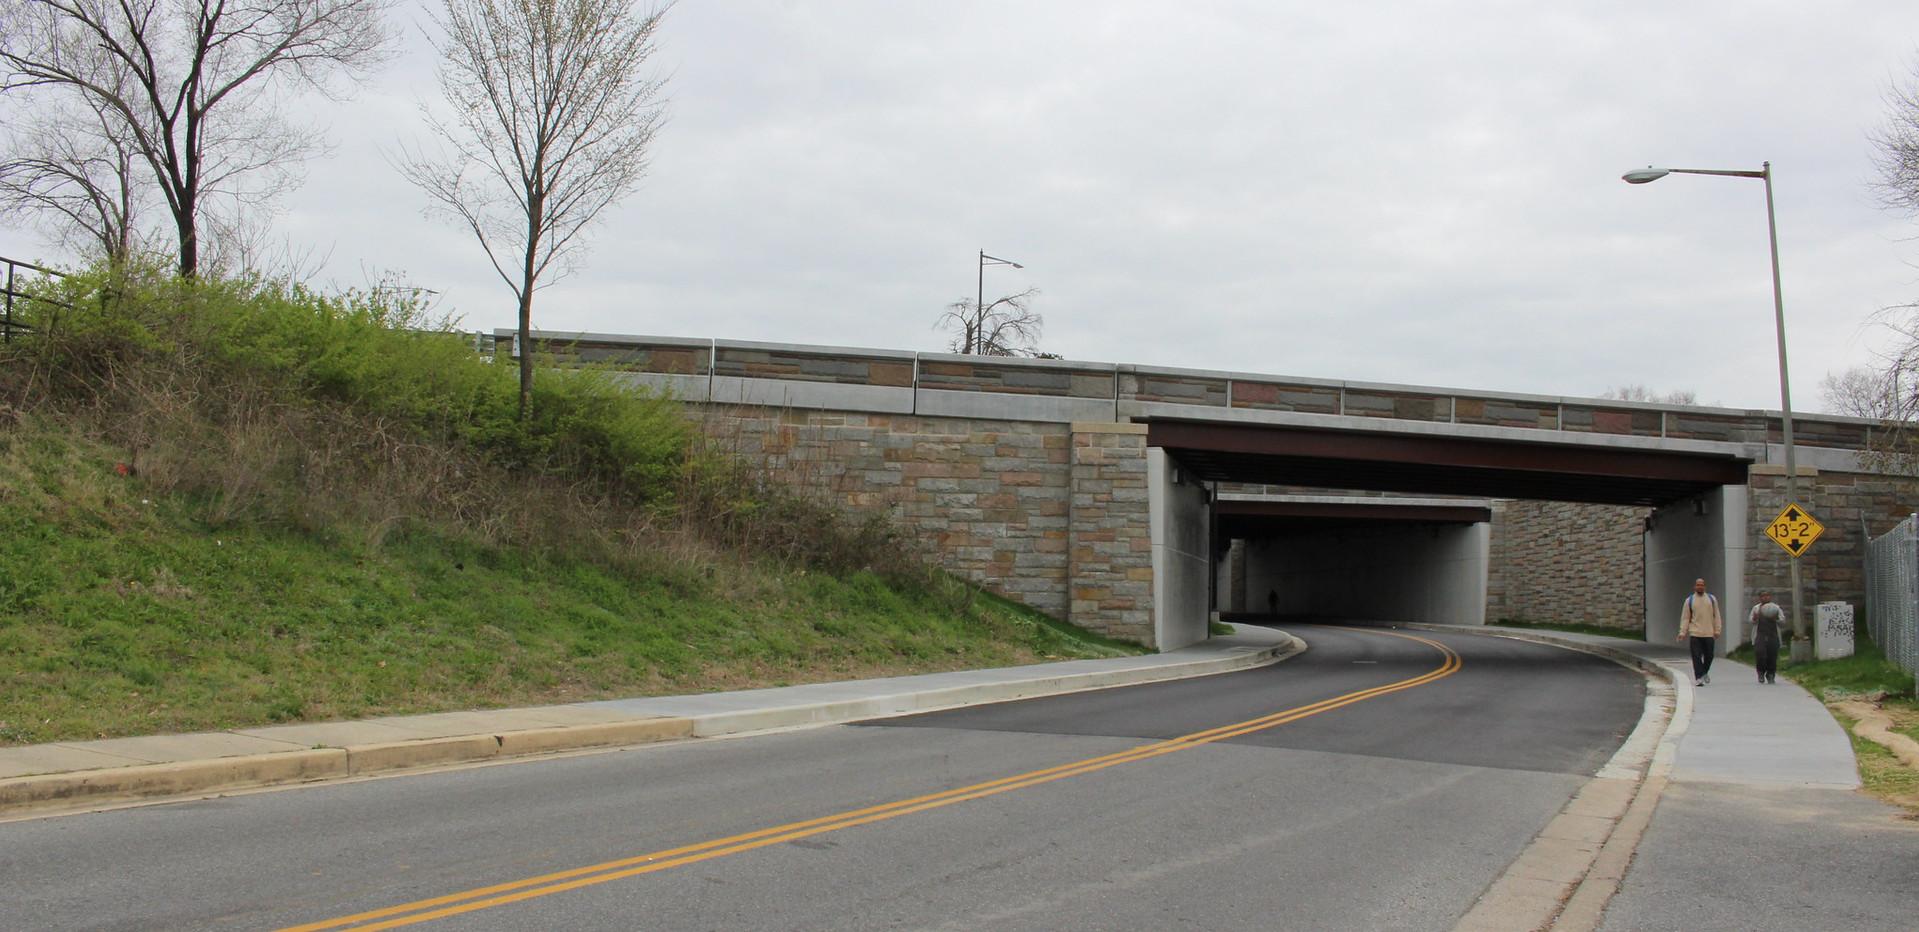 Rehabilitation of the Anacostia Bridges Over Nicholson St. SE